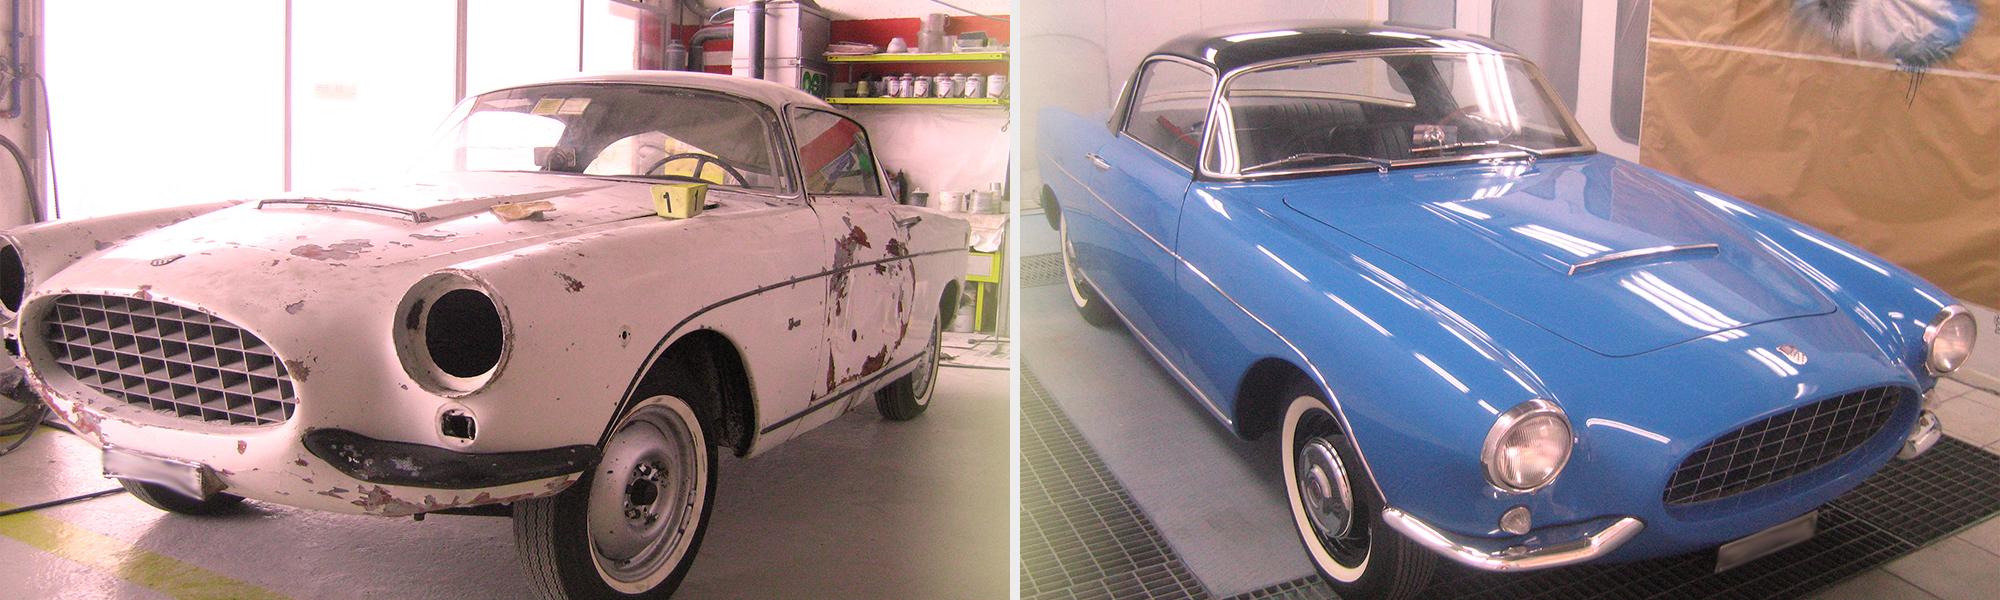 restauro auto epoca bologna